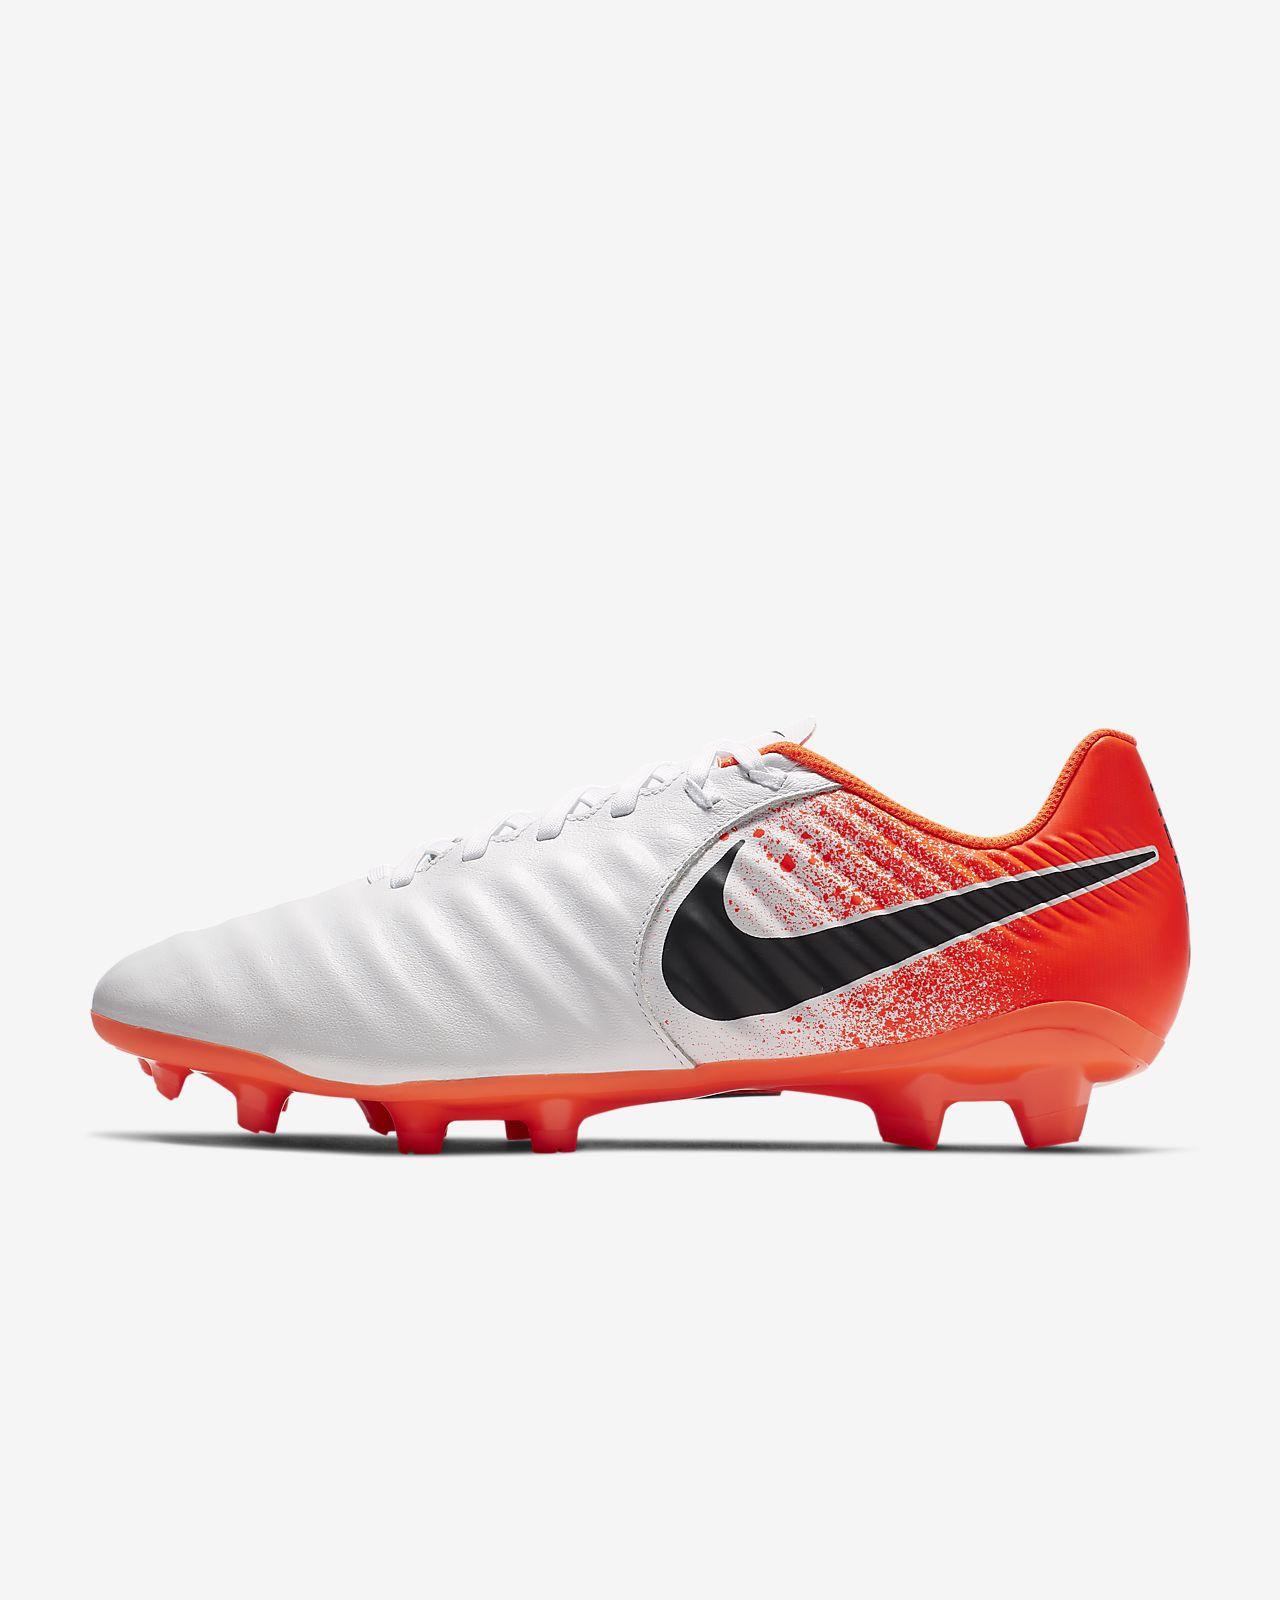 reputable site 27ece a9424 ... Nike Tiempo Legend VII Academy fotballsko til gress